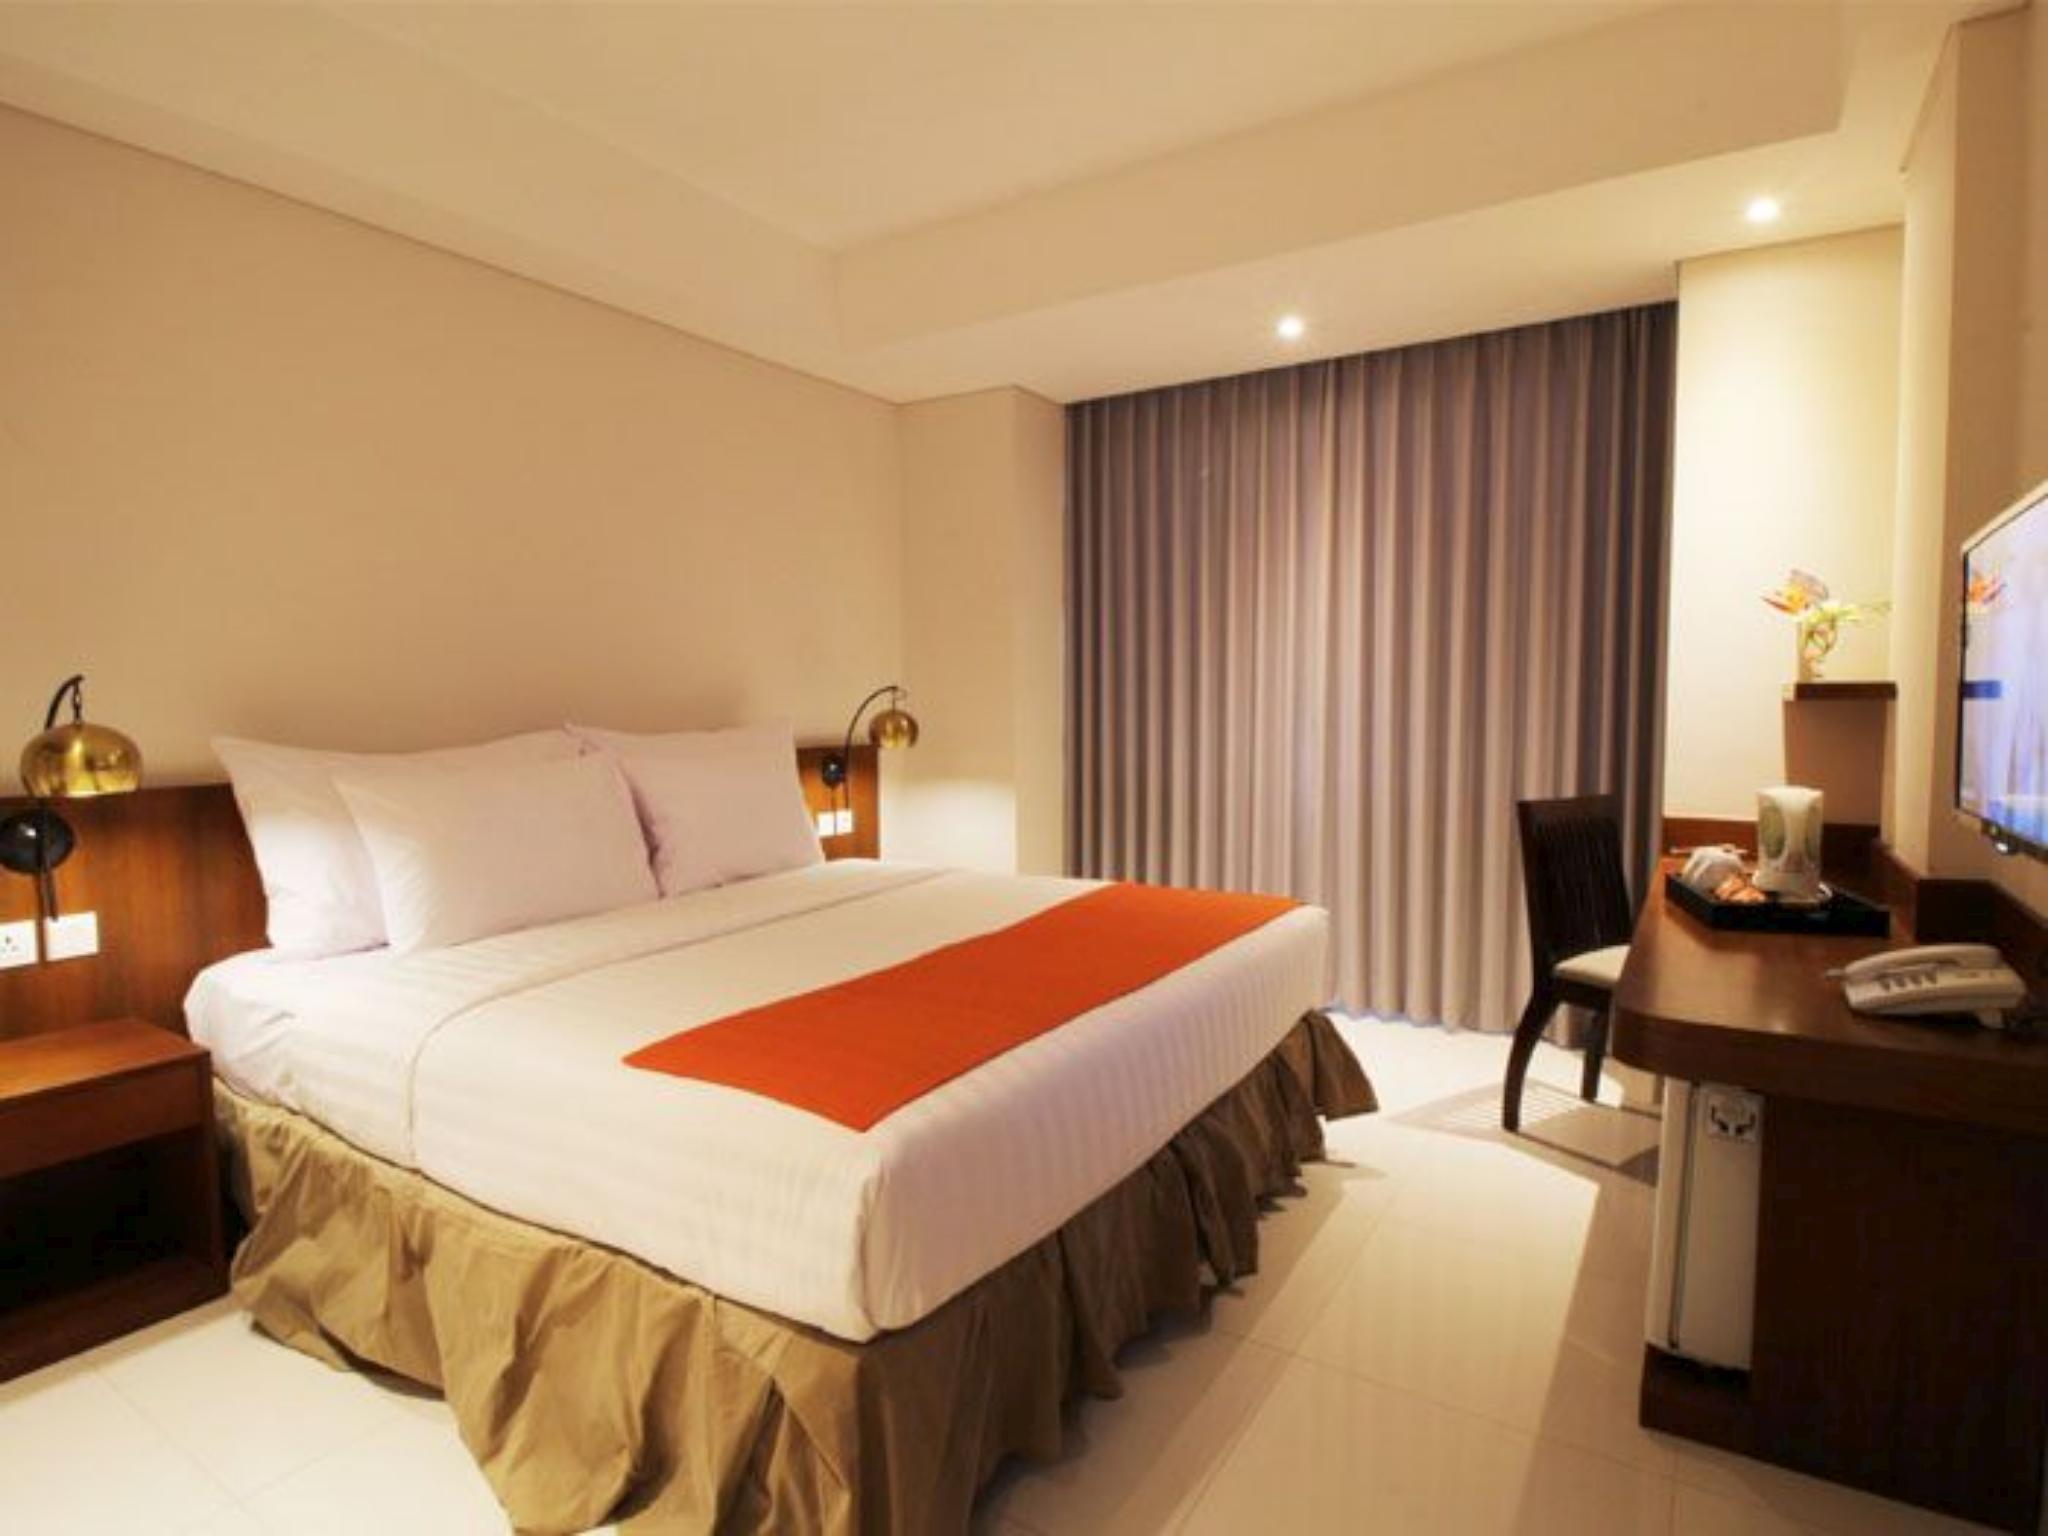 Hotel Signature Hotel Bali - Jalan Mertanadi no.74, Kerobokan Bali - Bali